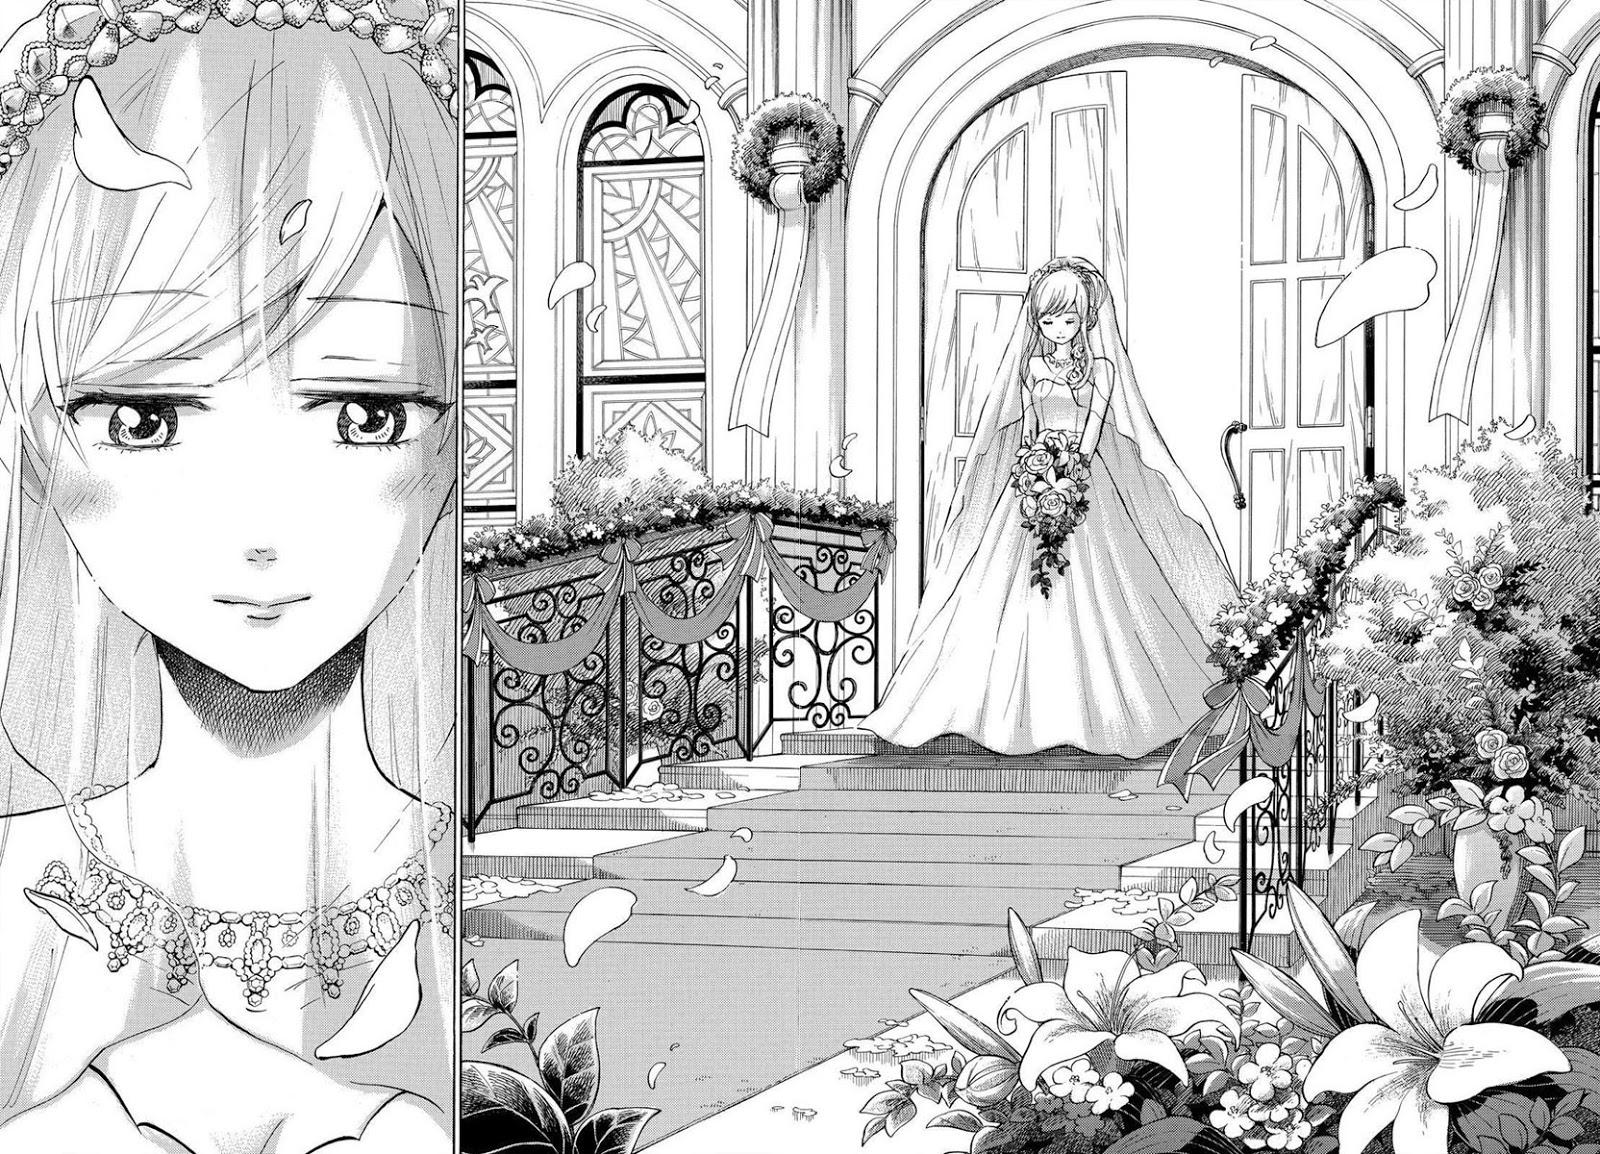 Yamada-kun to 7-nin no Majo Chapter 243-16